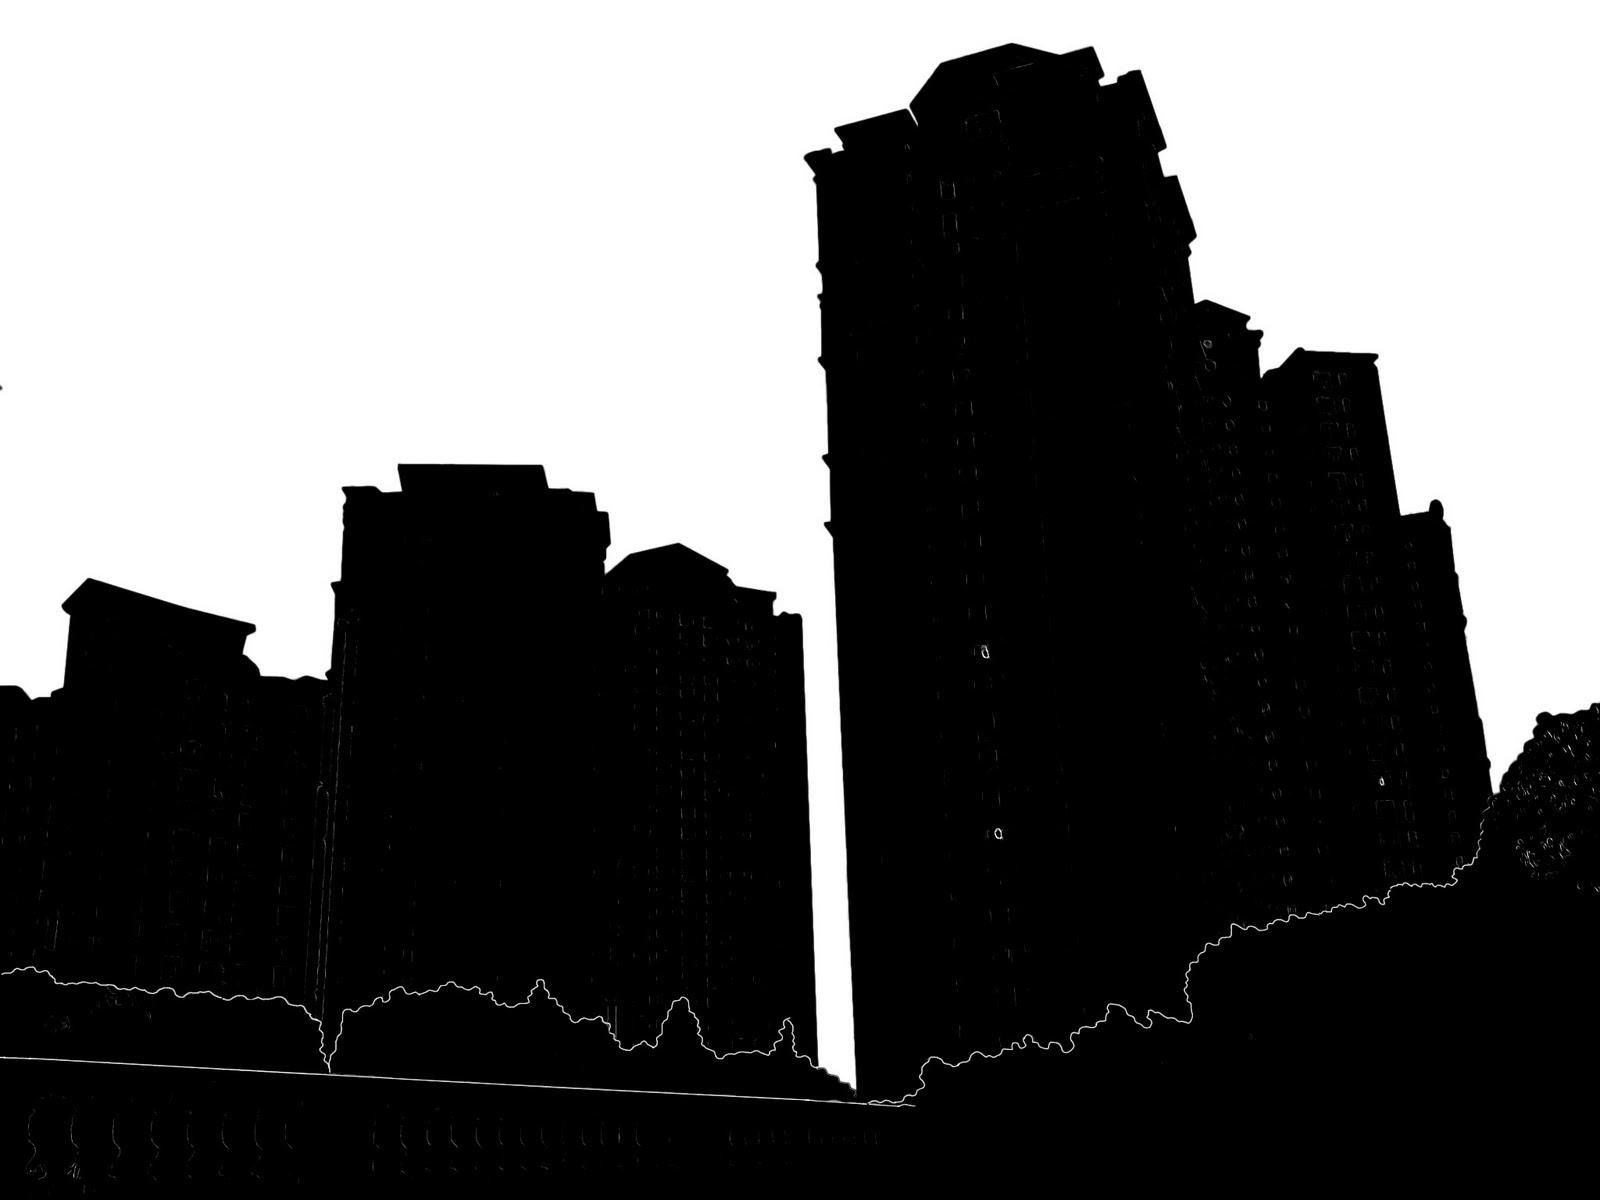 1600x1200 Building Silhouette Clipart